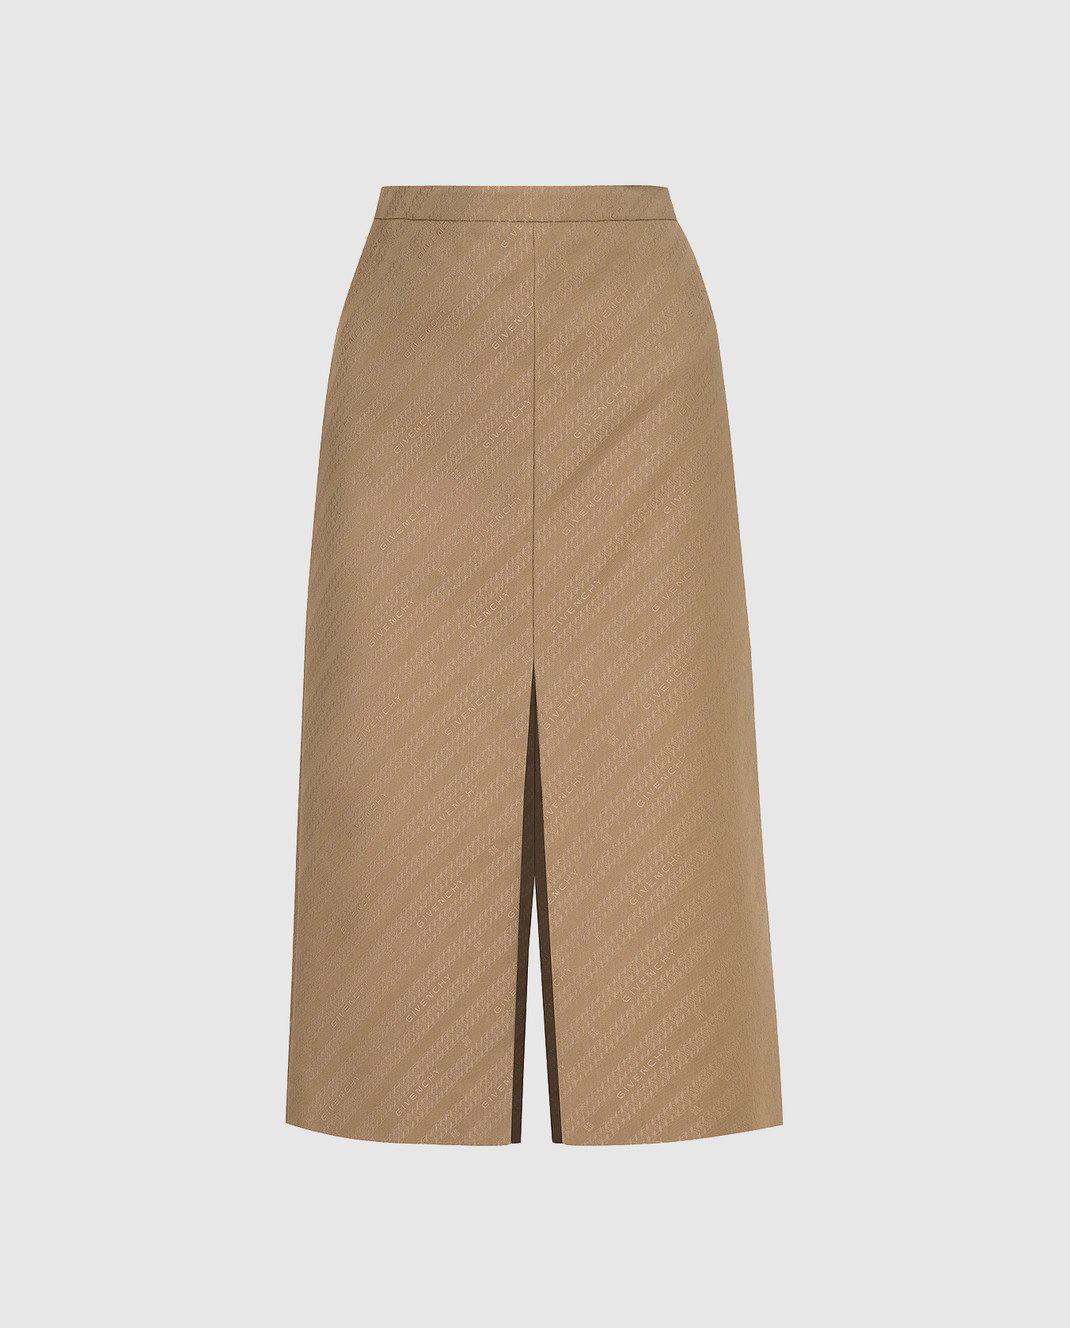 Givenchy Бежевая юбка изображение 1